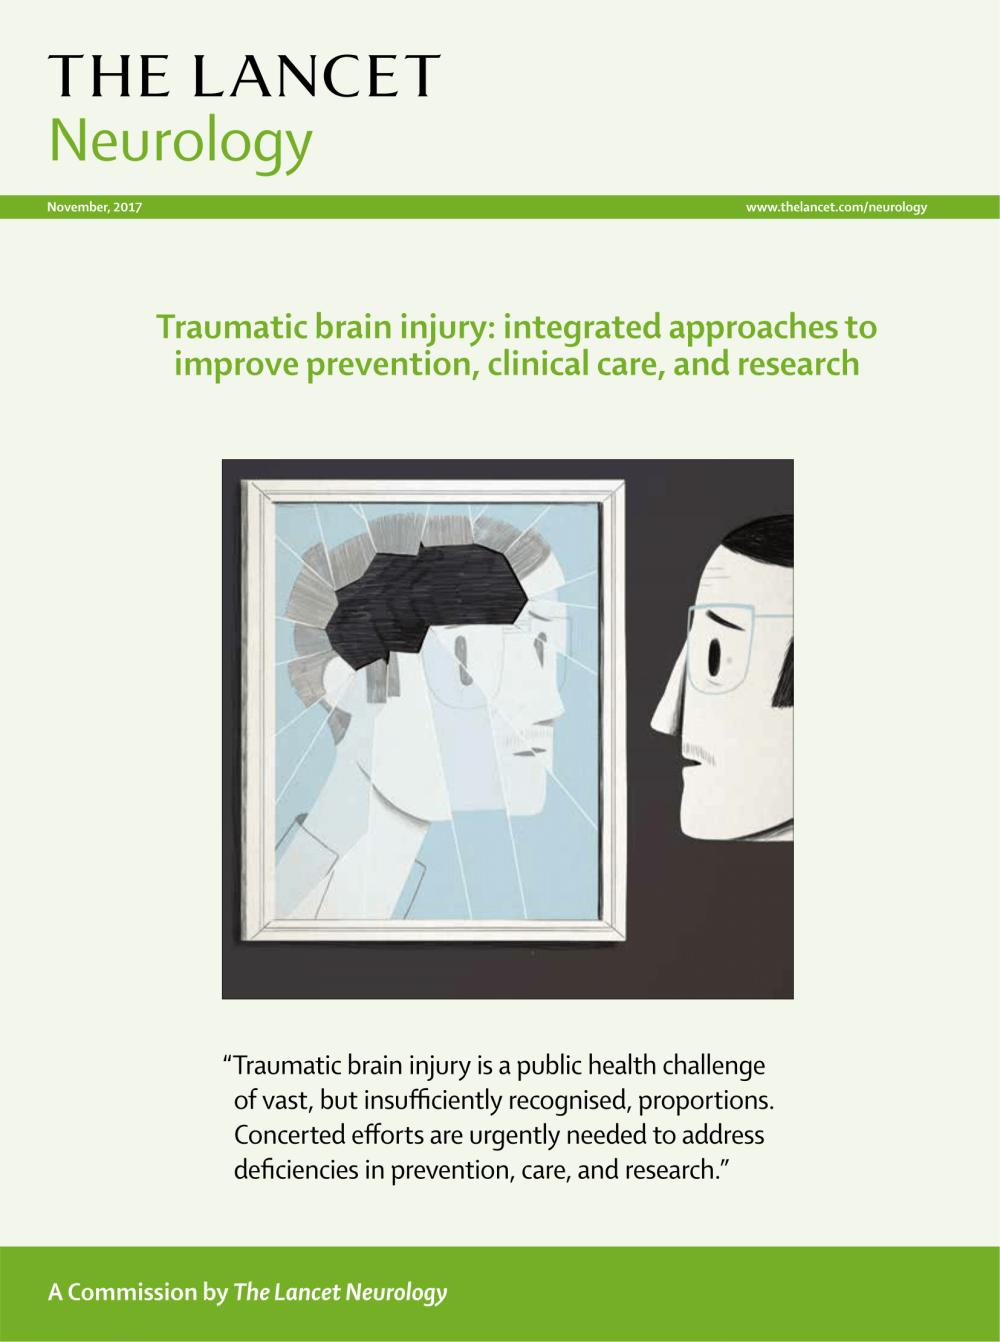 medium resolution of the lancet neurology commission on traumatic brain injury